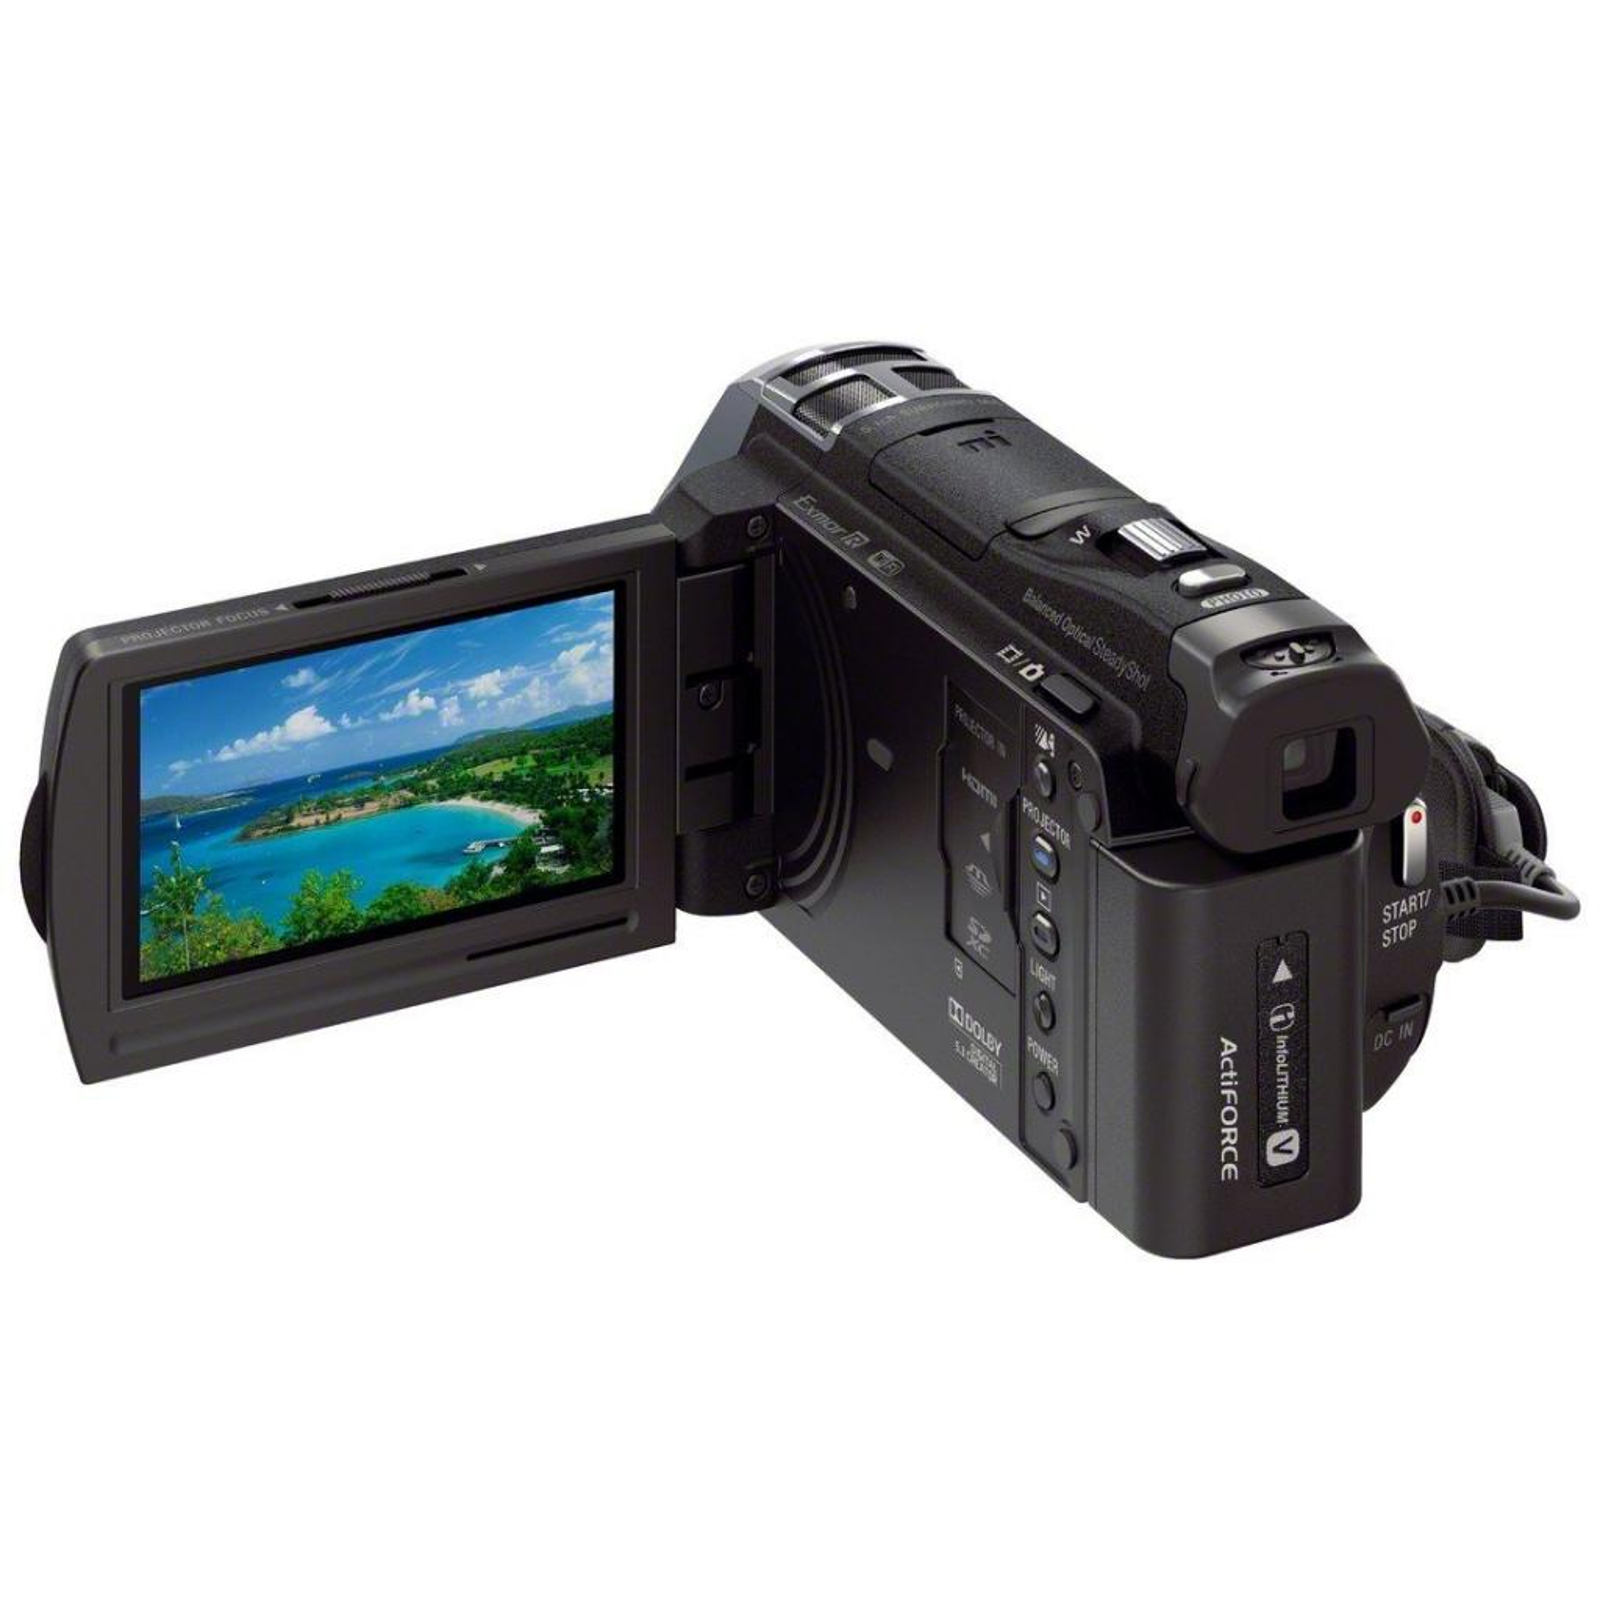 Цифровая видеокамера SONY Handycam HDR-PJ810 Black (HDRPJ810EB.CEL) изображение 9